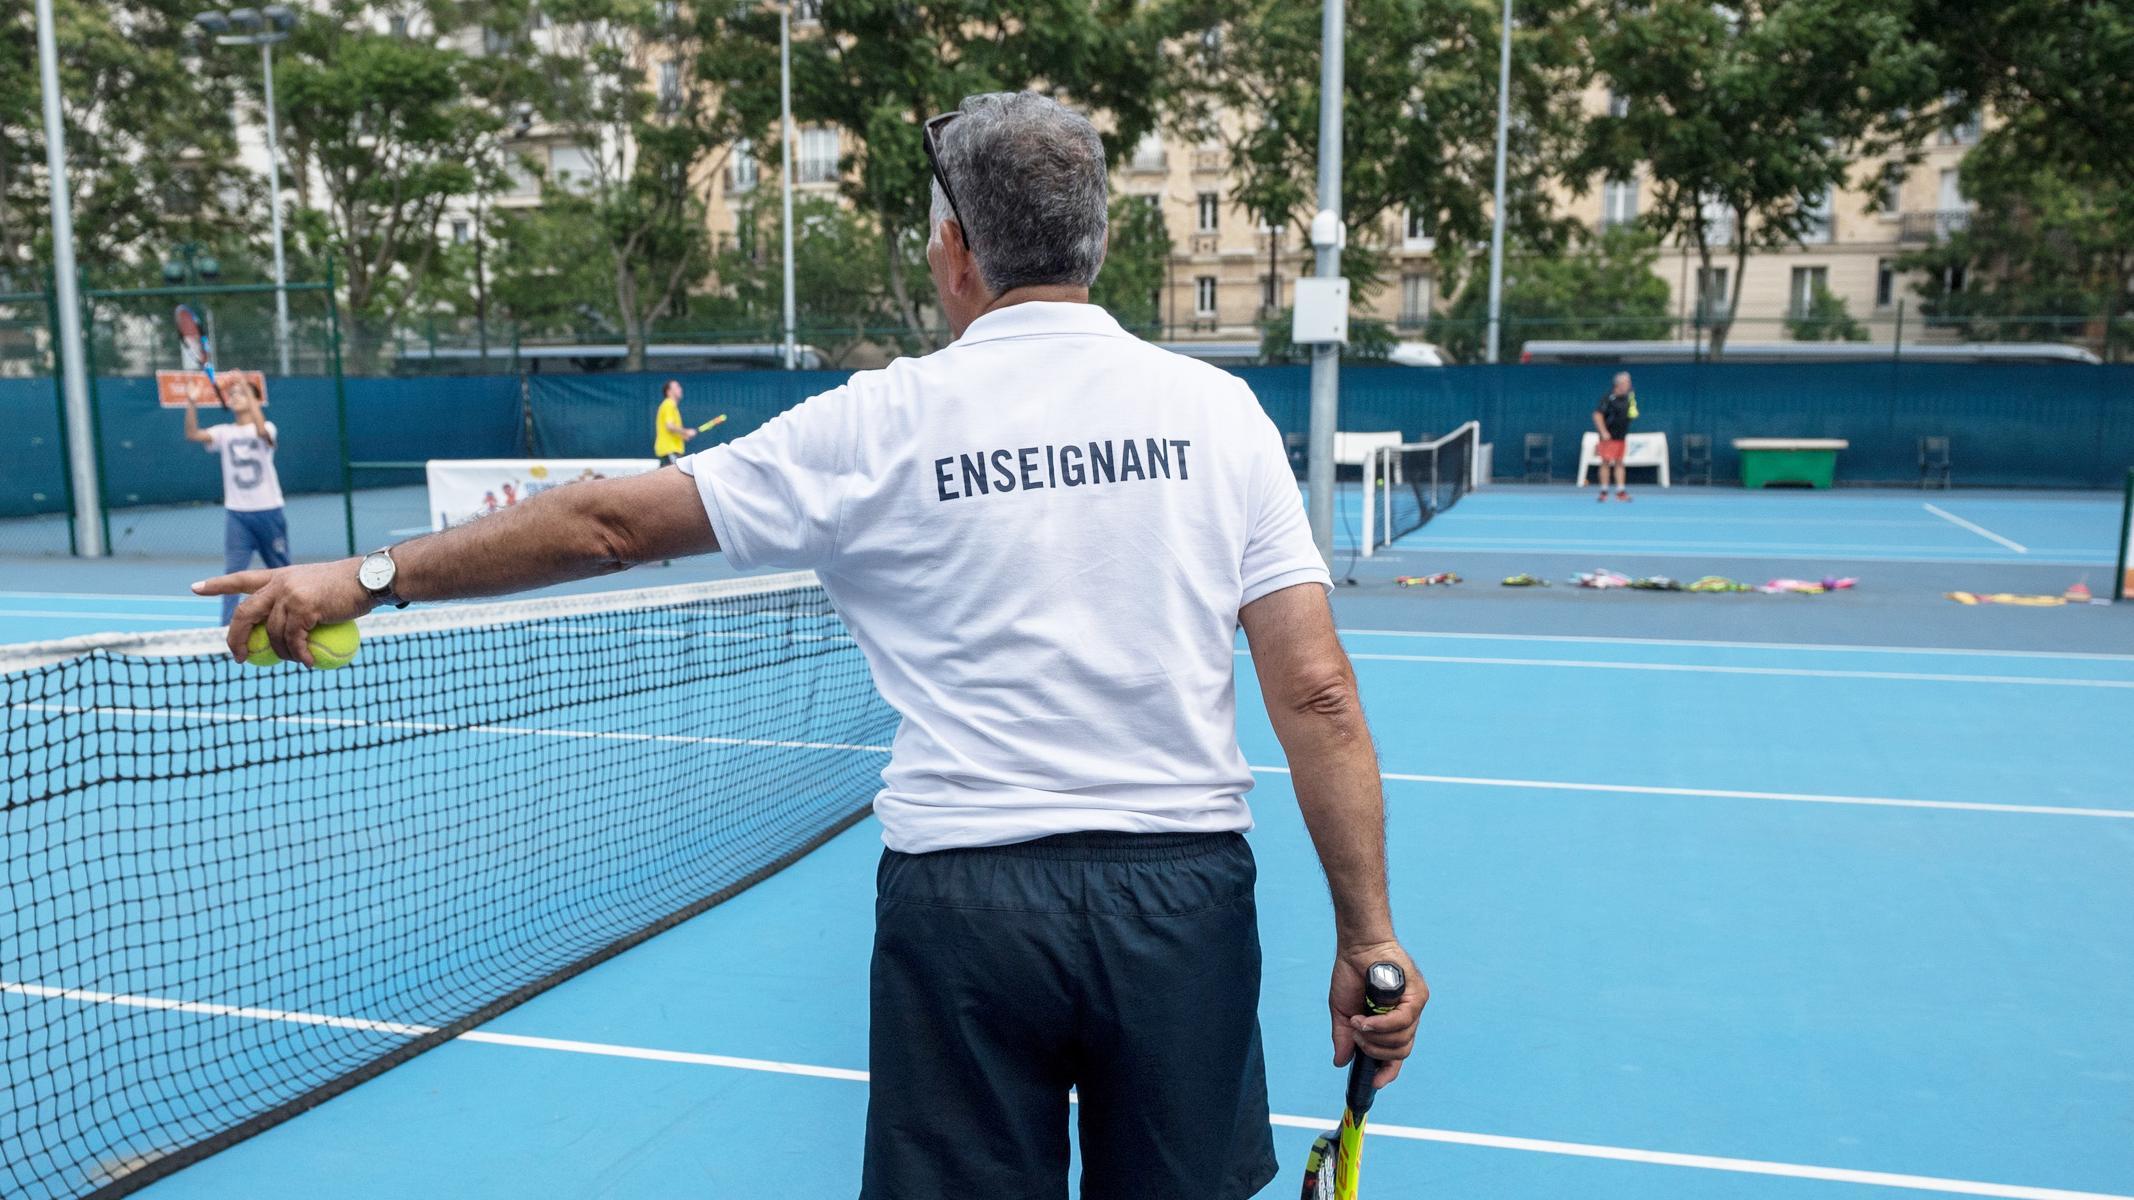 Rencontres instructeur de tennis